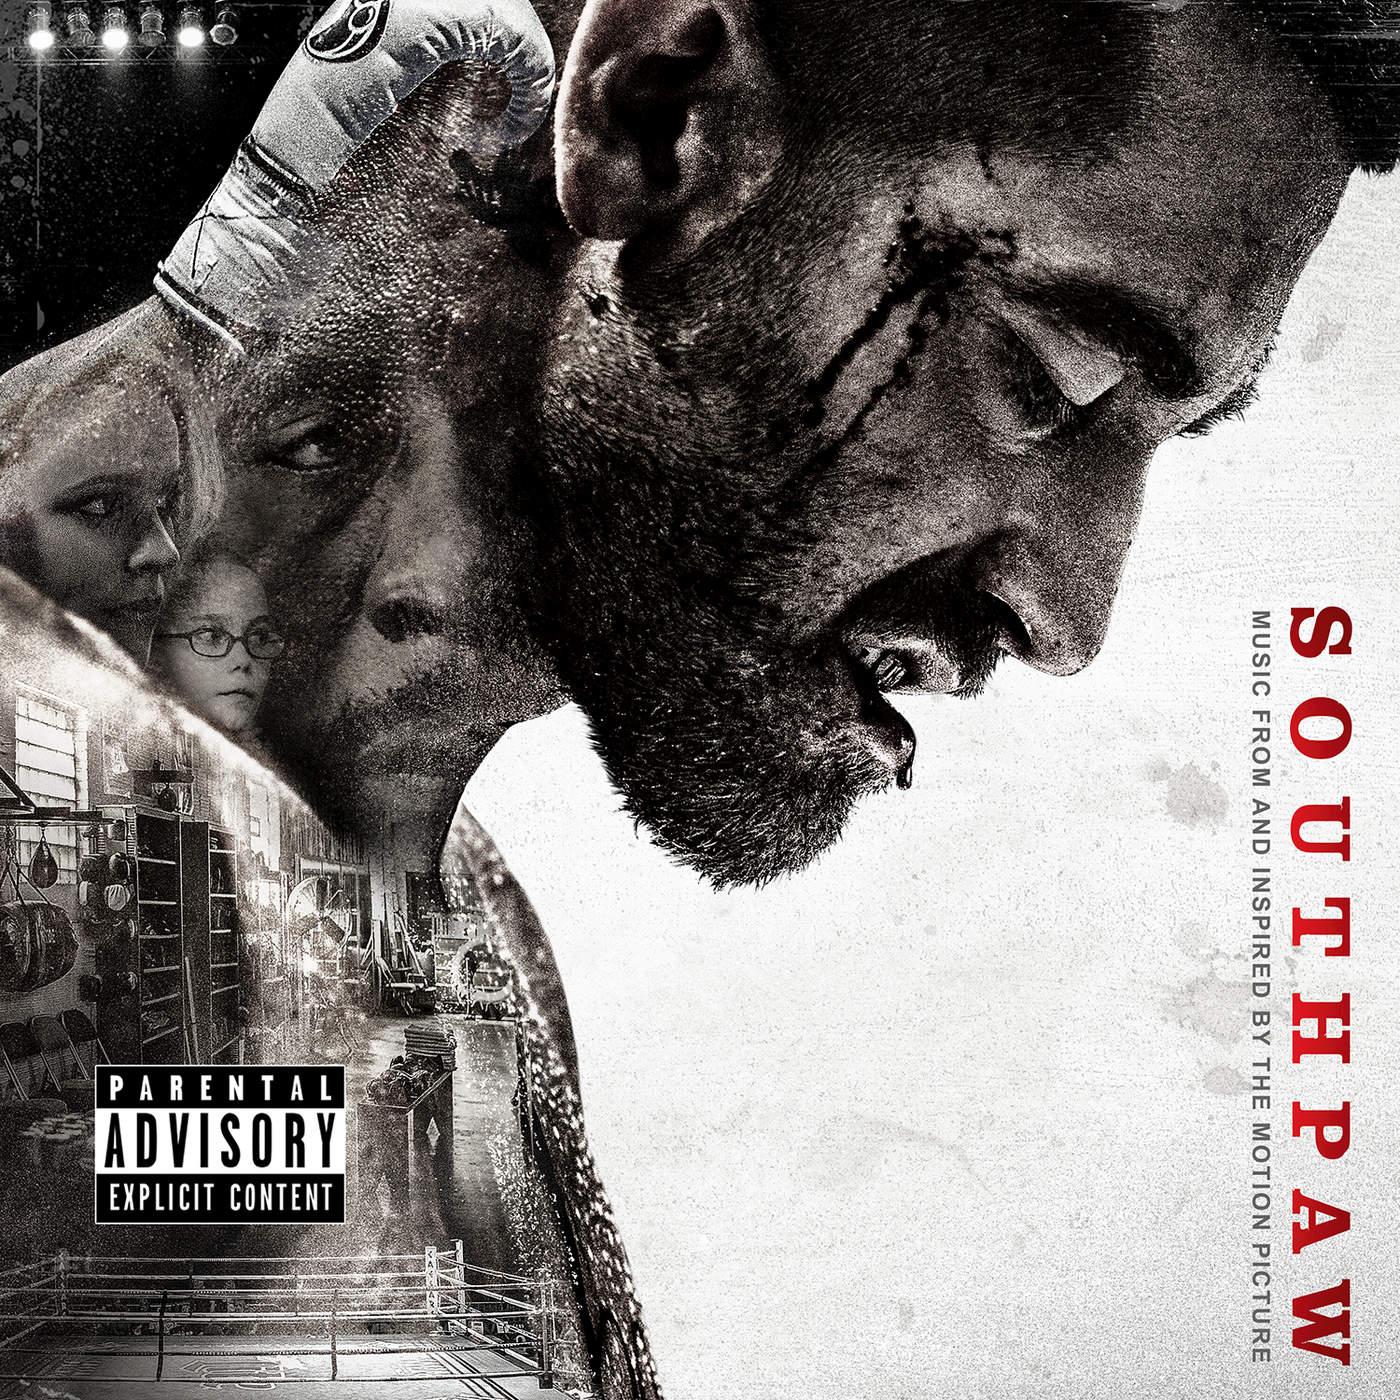 Eminem Venom 320kbps Mp3: Kings Never Die (feat. Gwen Stefani